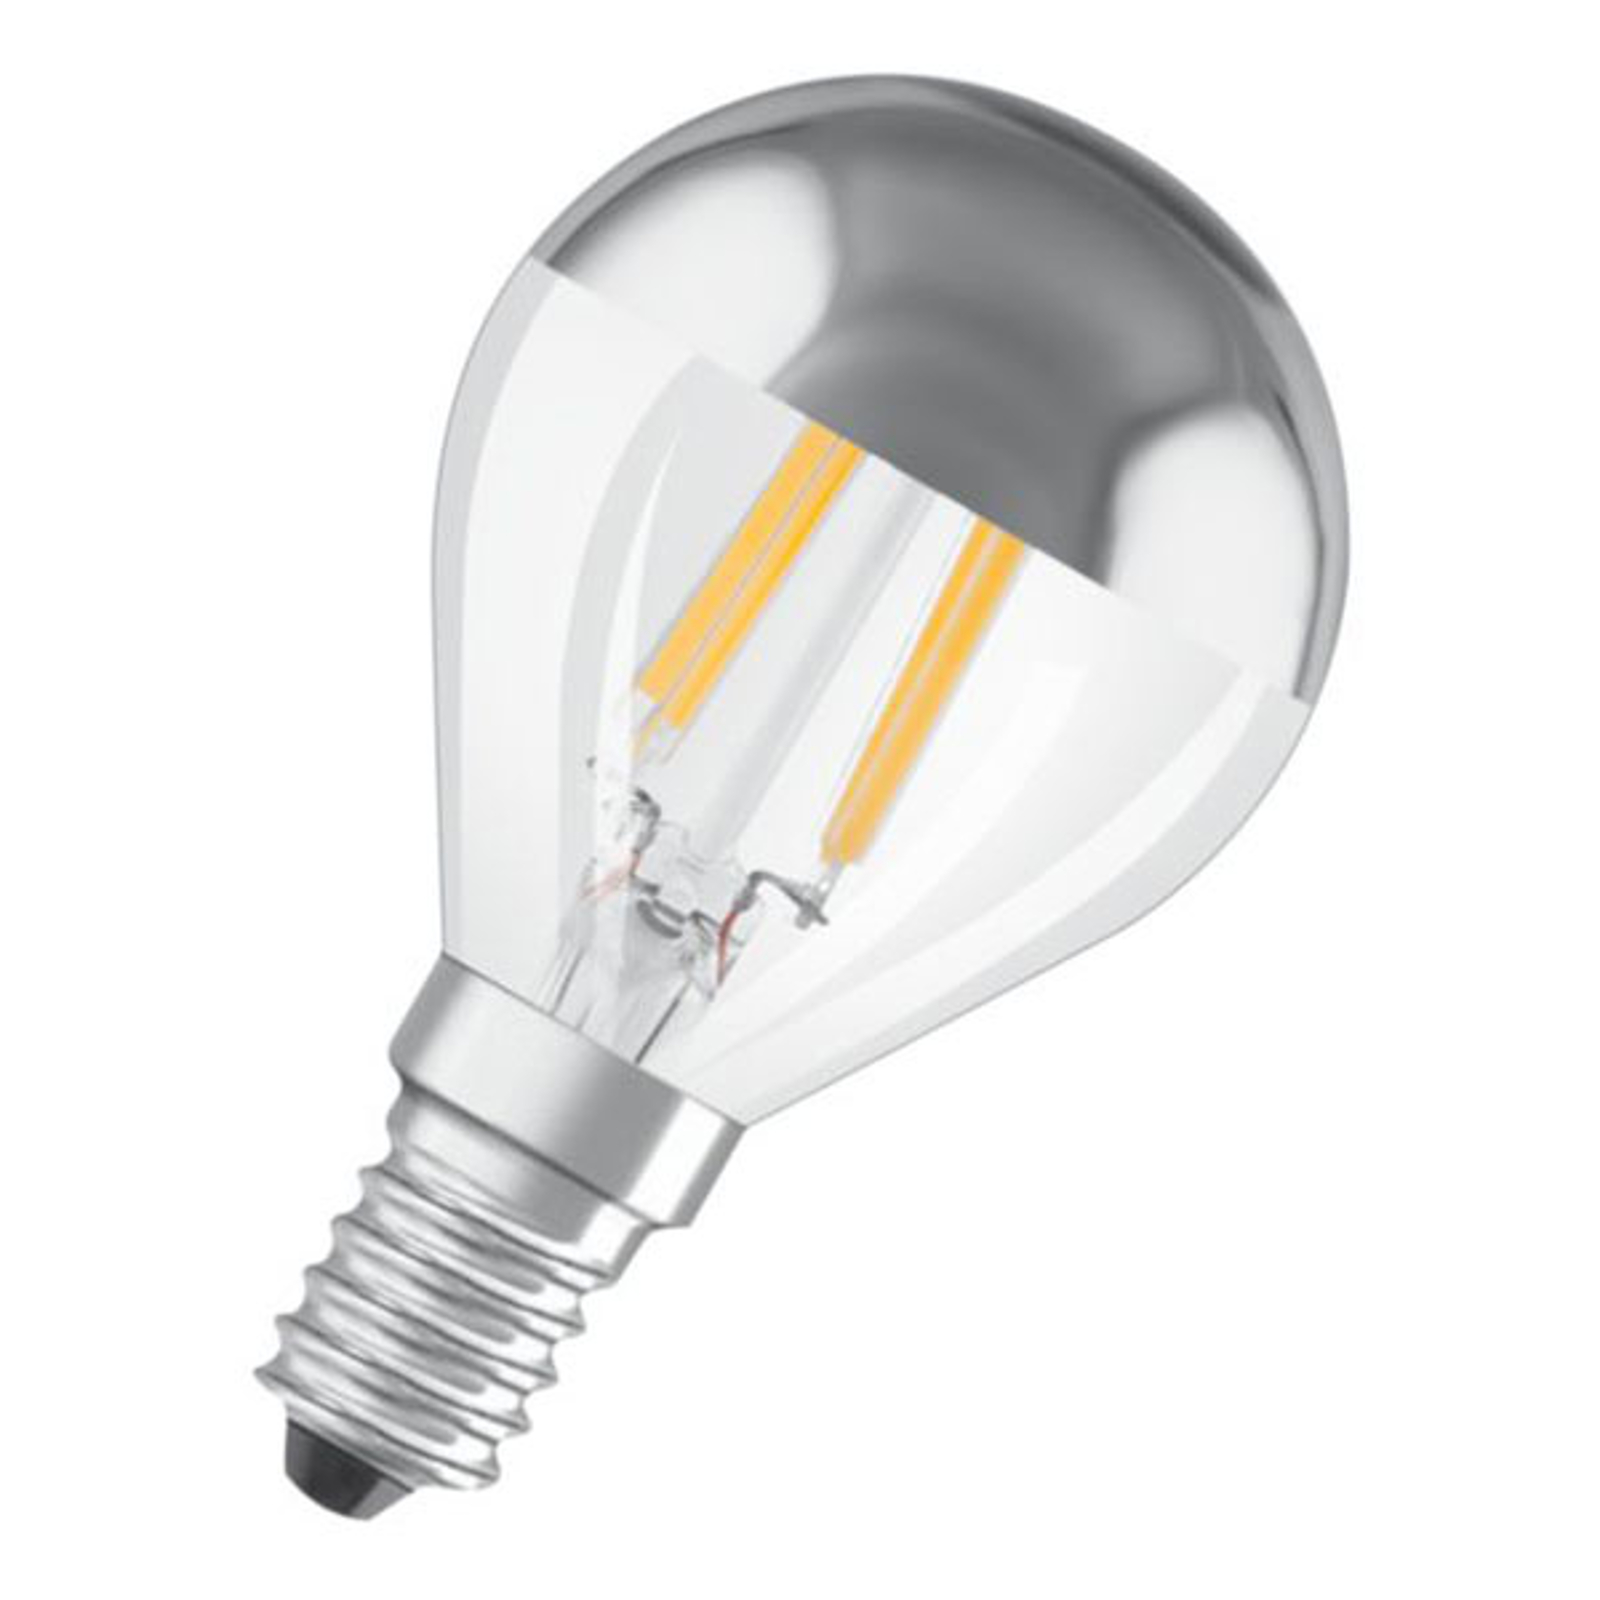 OSRAM Classic P Mirror LED-Lampe E14 4W 2.700K